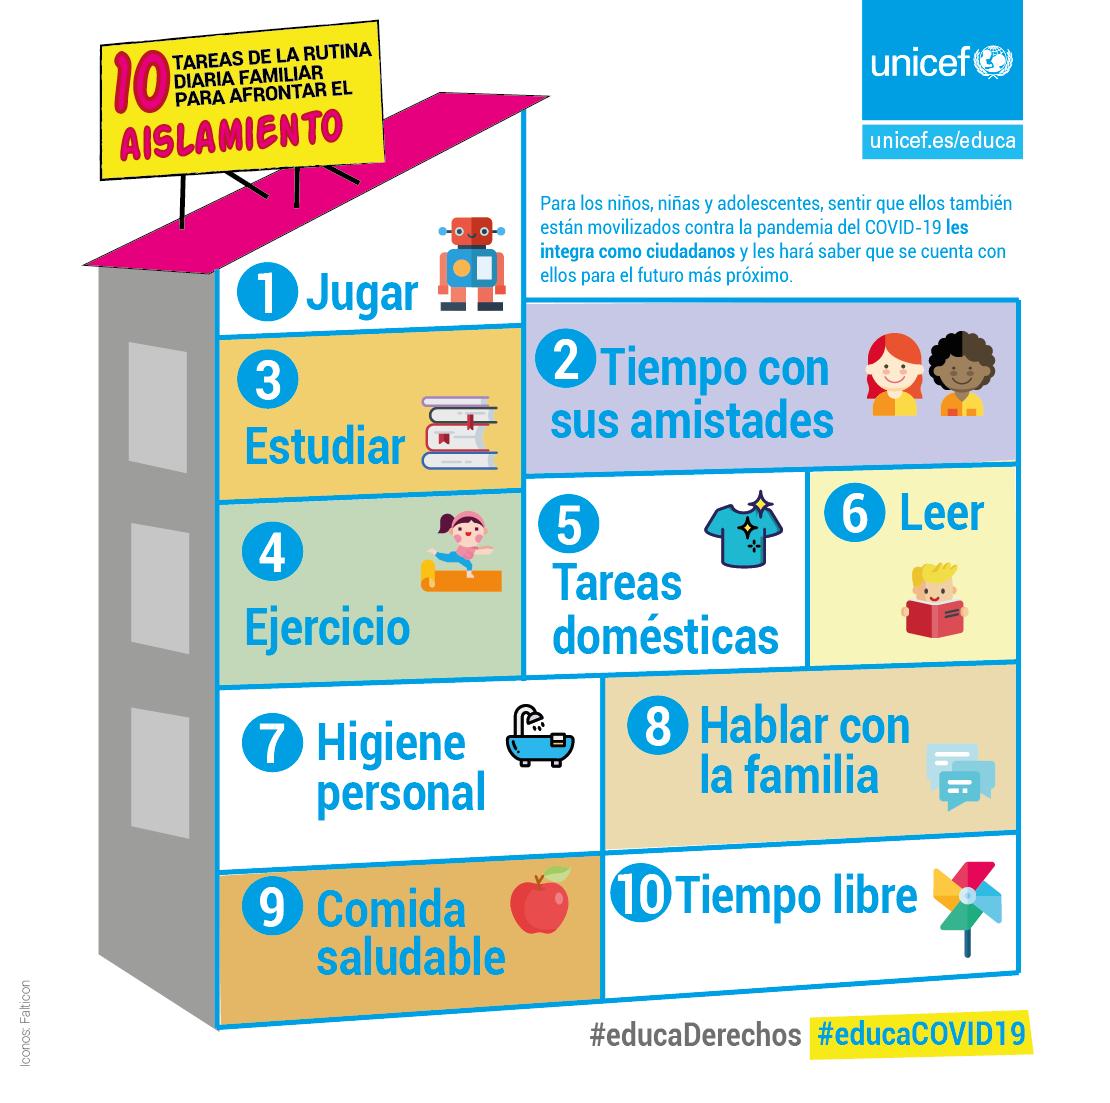 https://www.unicef.es/educa/blog/10-tareas-rutina-diaria-familia